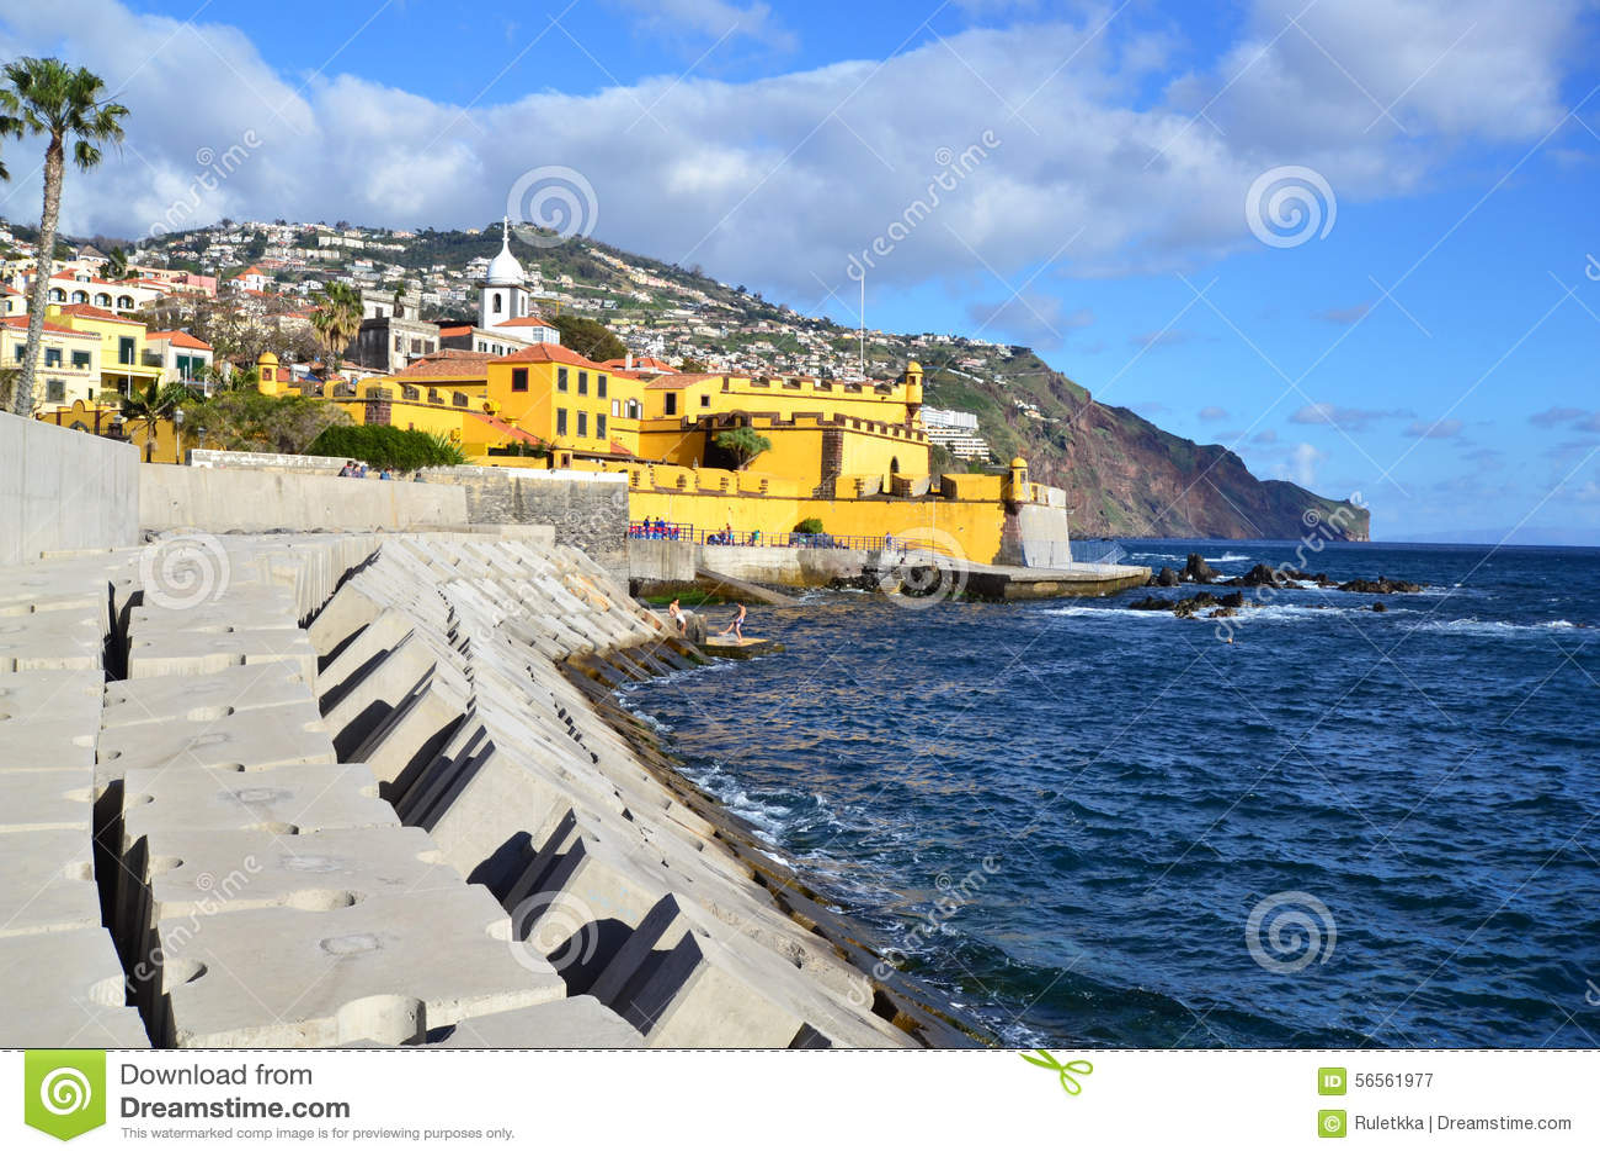 Download Όμορφη άποψη της πόλης του Φουνκάλ, Πορτογαλία Εκδοτική Φωτογραφία - εικόνα από οχύρωση, ancientness: 56561977